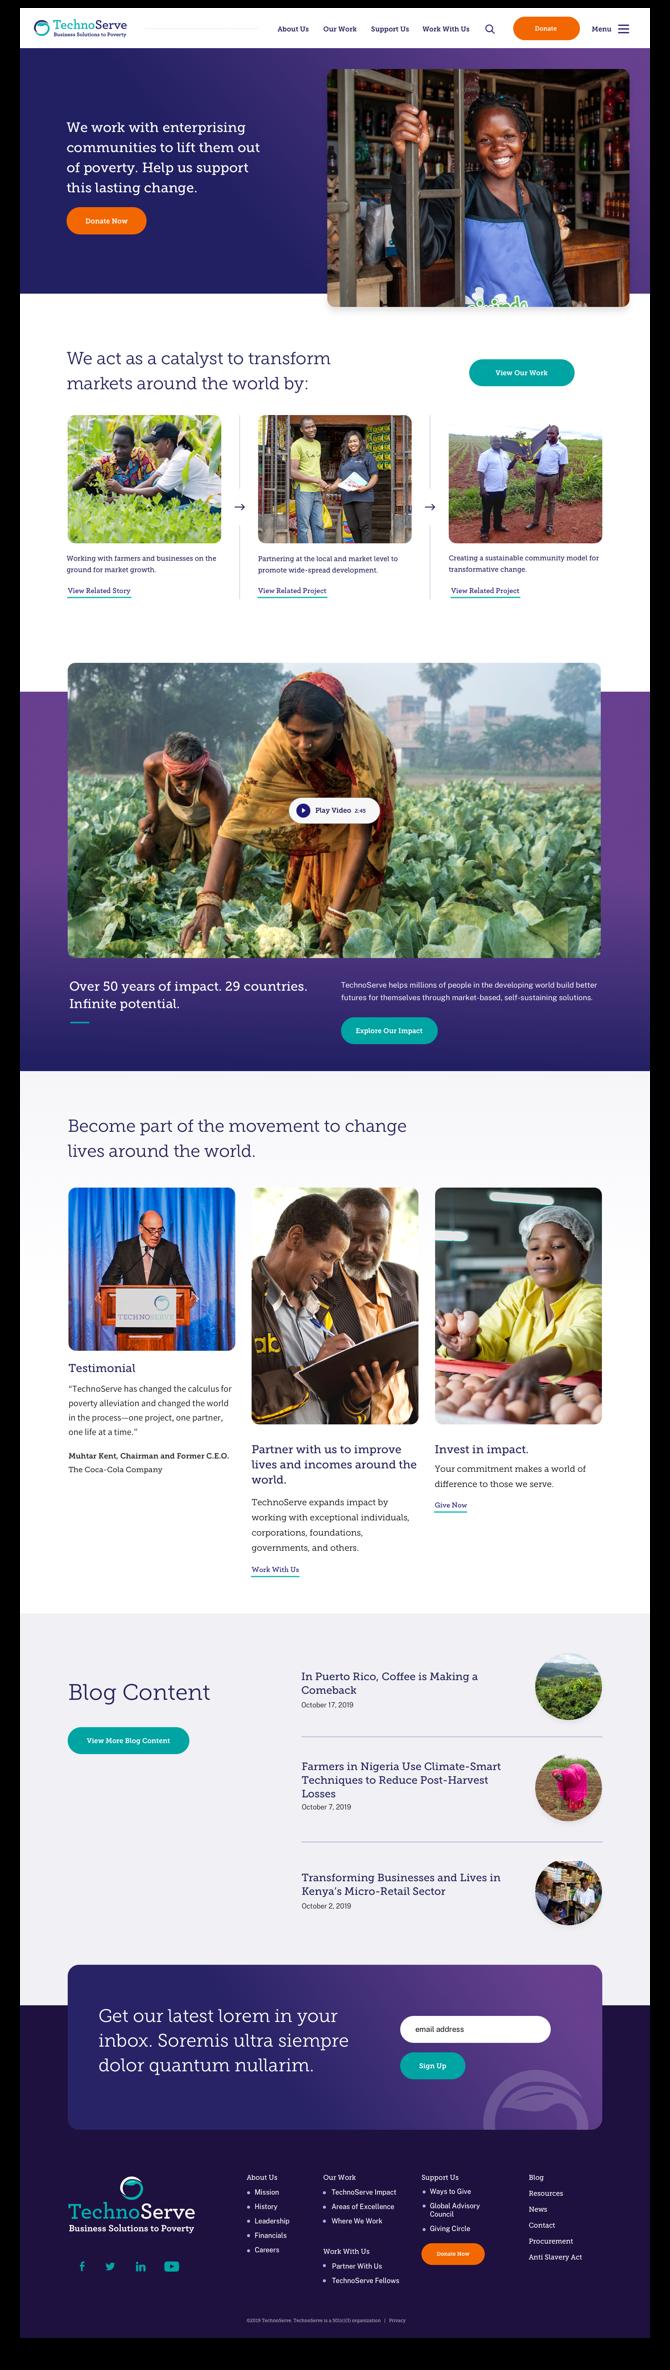 TechnoServe's homepage.